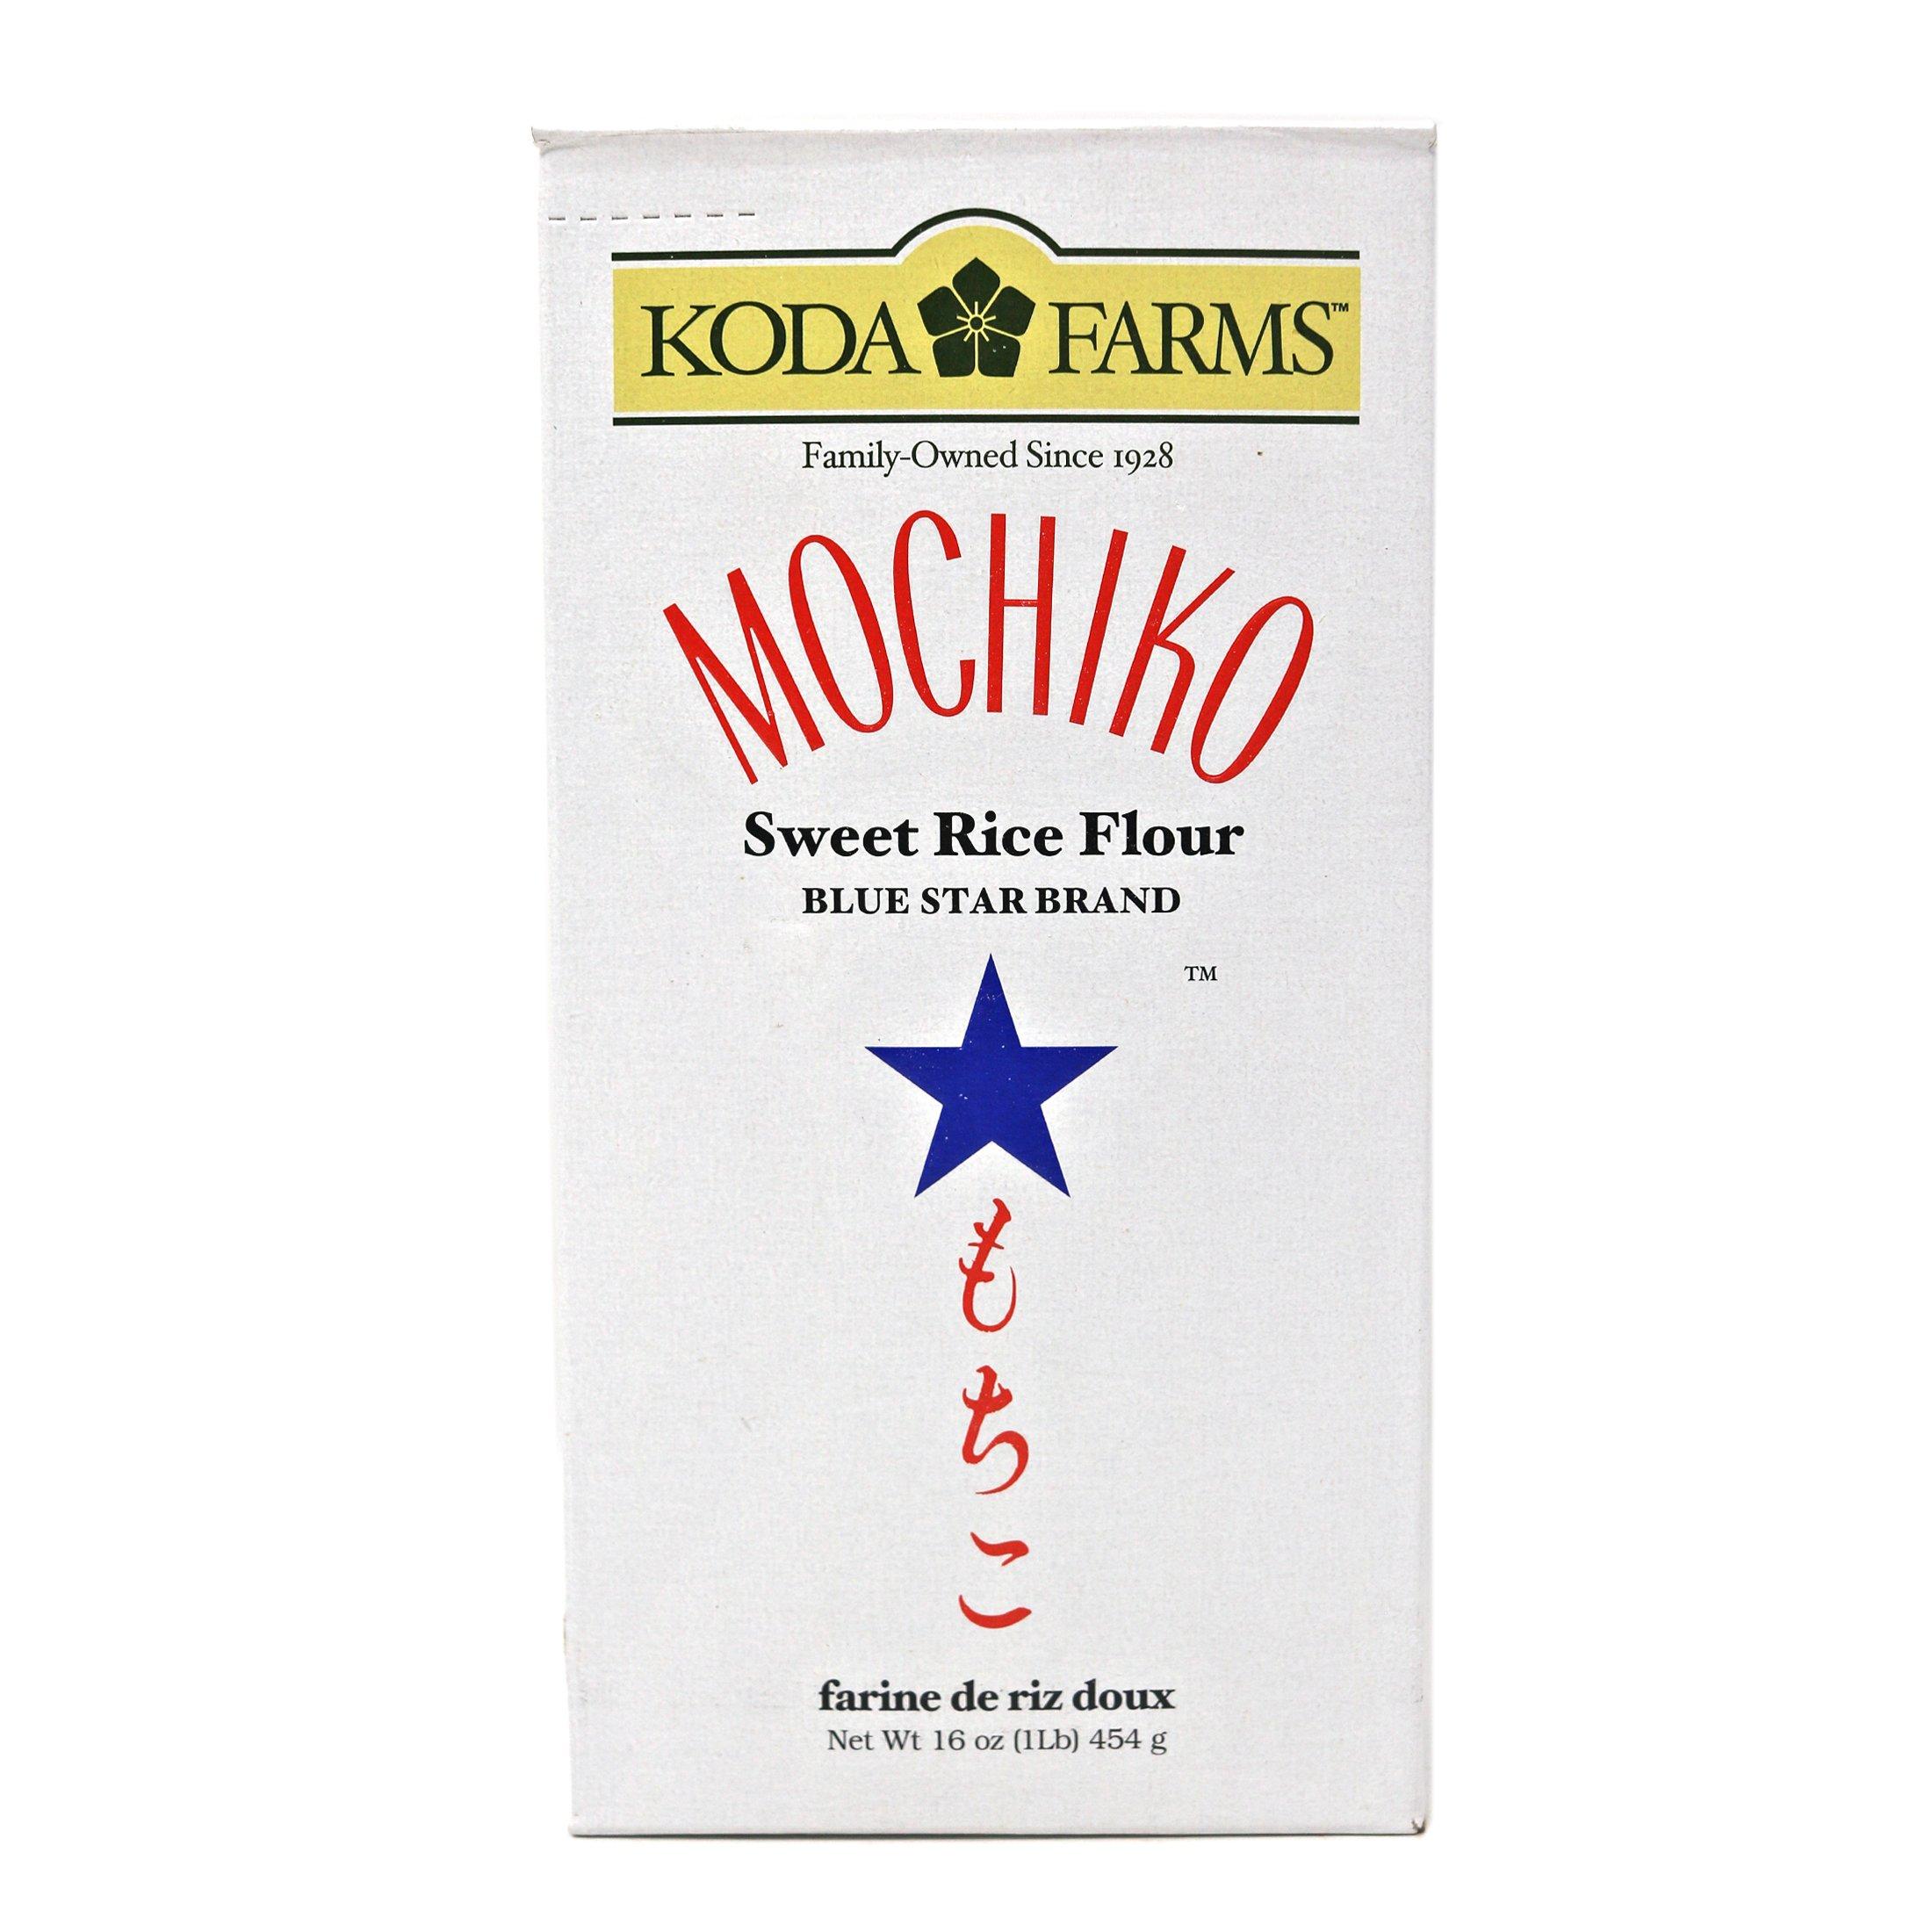 Koda Farms Mochiko Sweet Rice Flour 1 Lb (4 Pack)